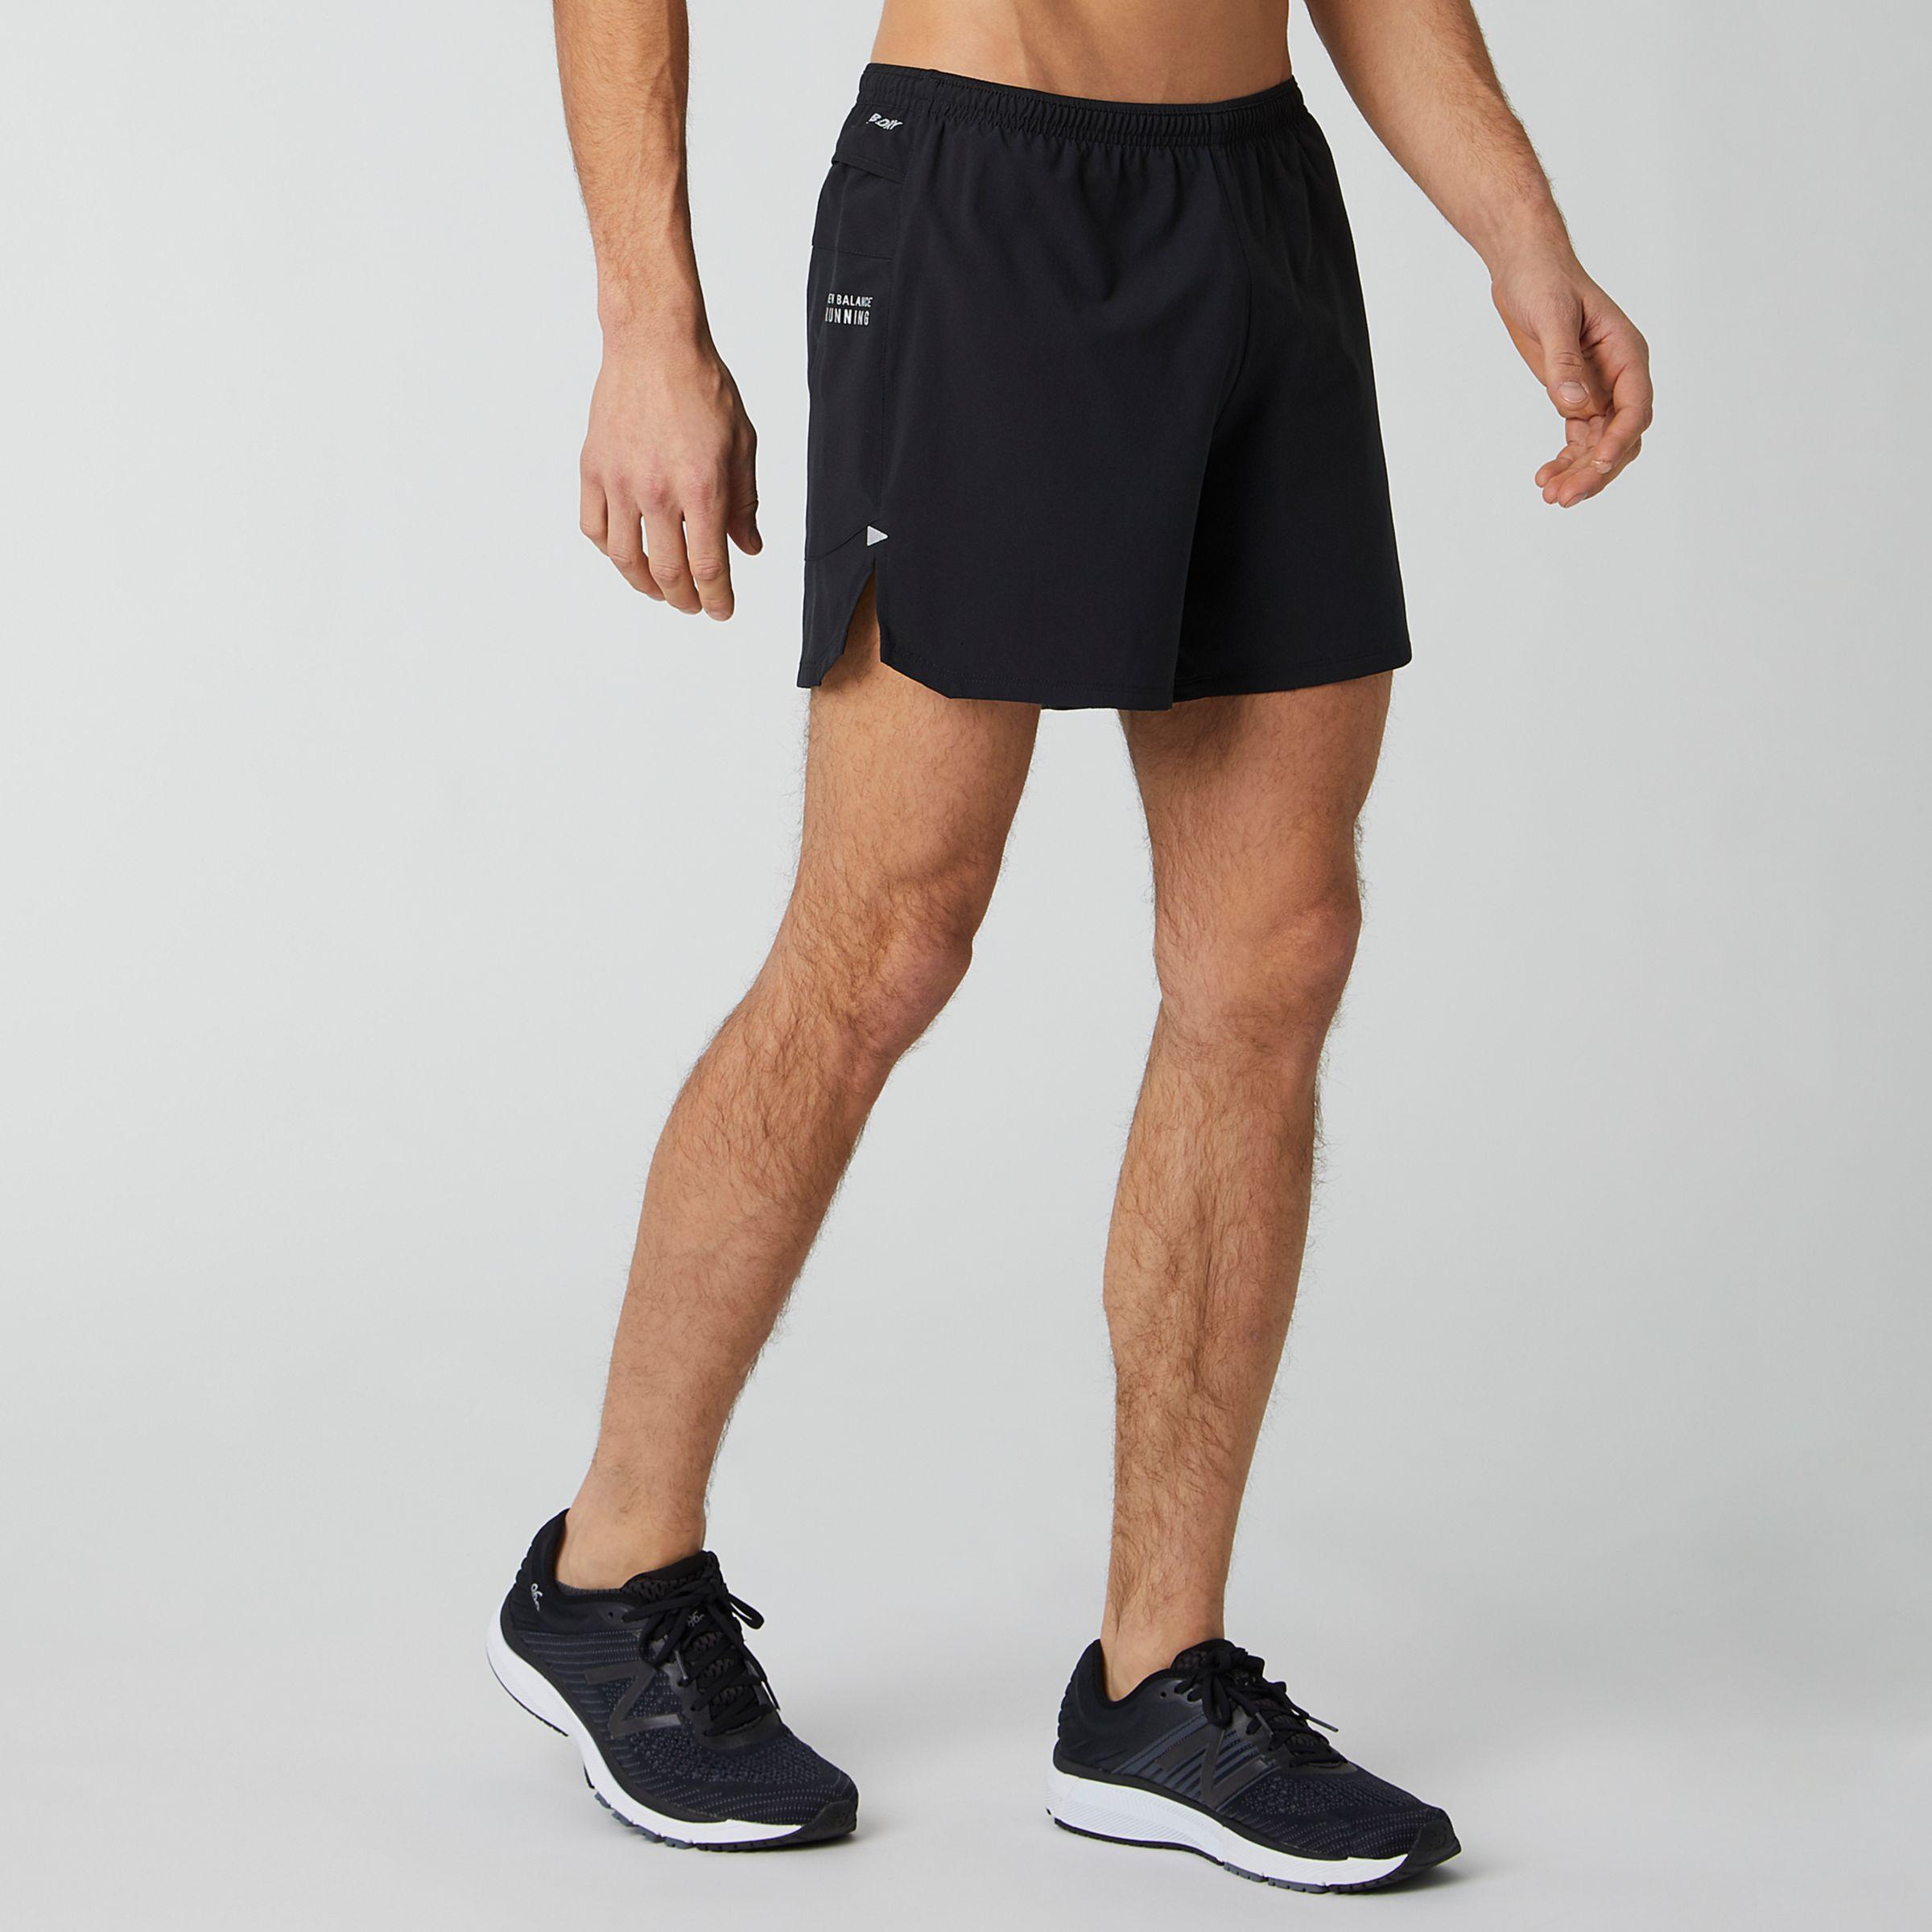 new balance running clothes